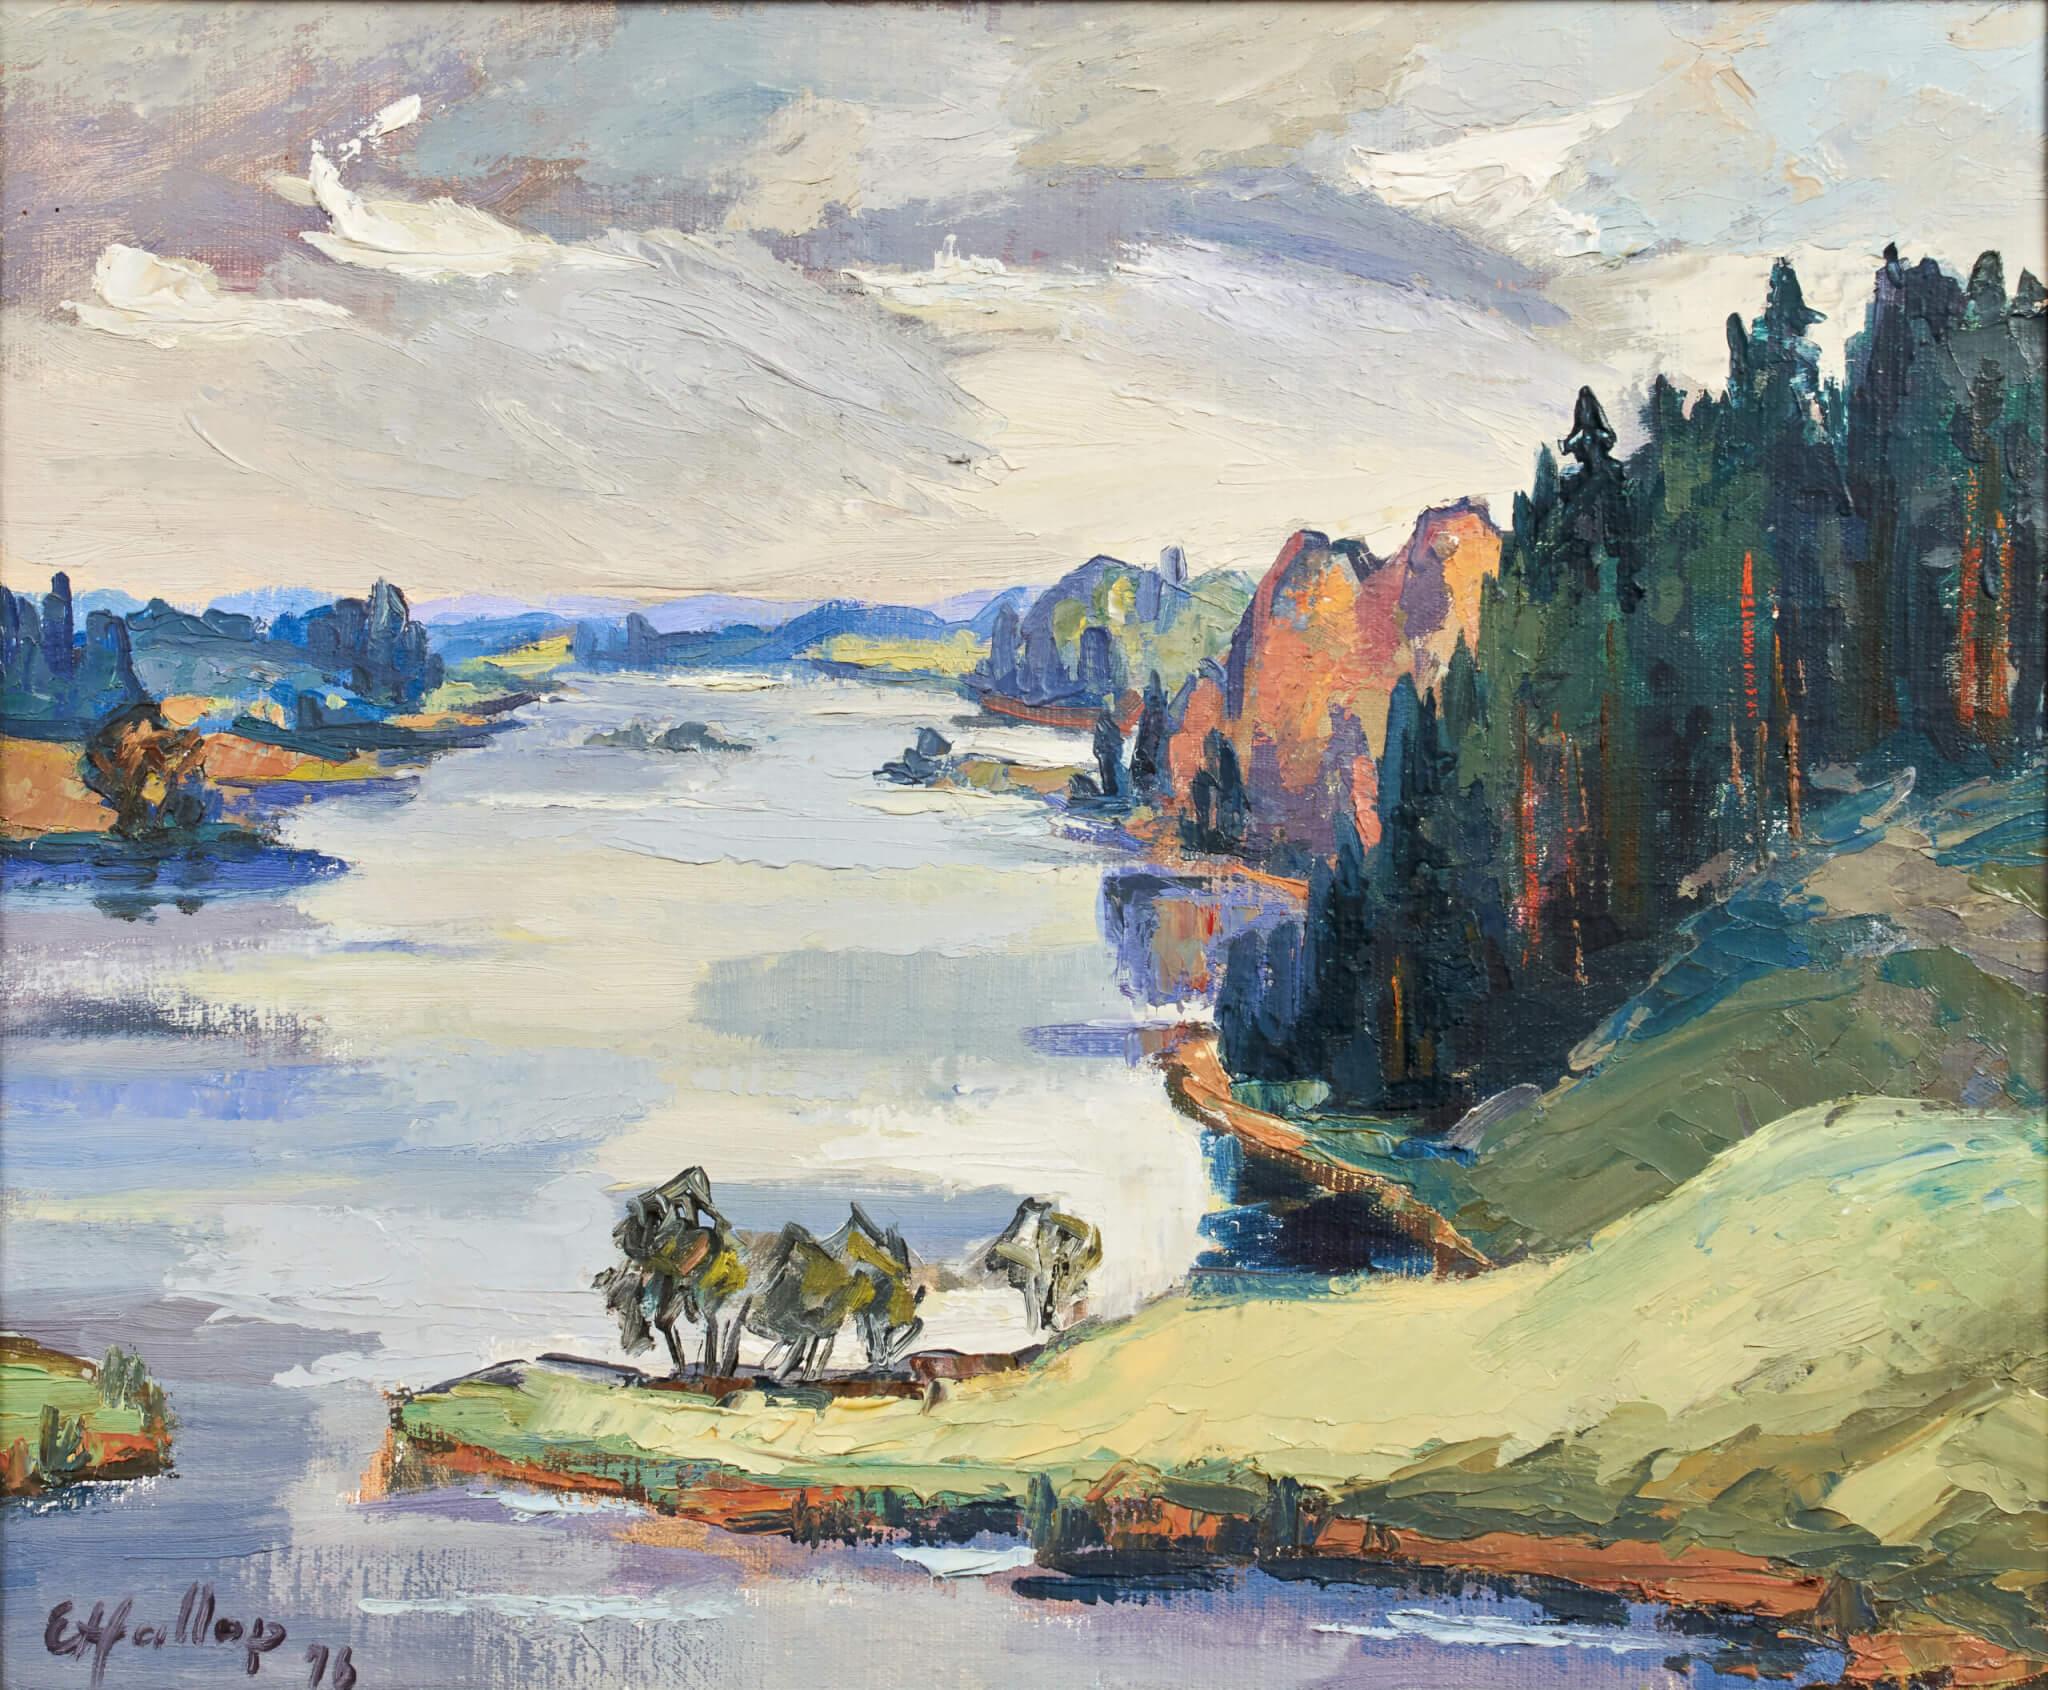 Ernst-Hallop-Lõõdla-järv-Võrumaa